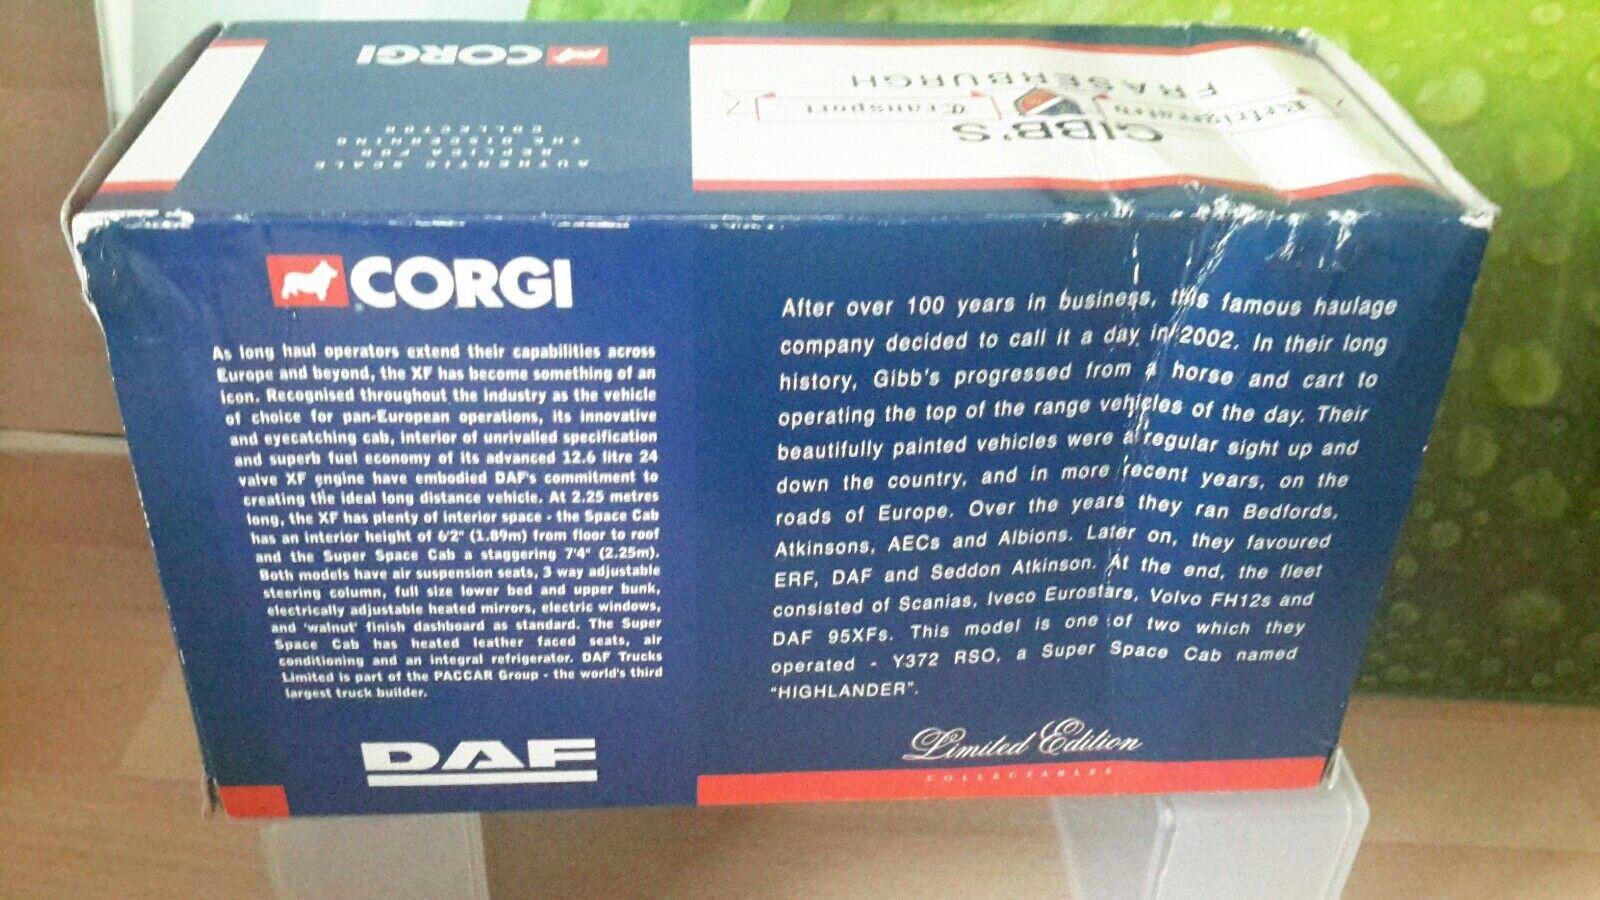 CORGI moderno CC13210 DAF 95XF-GIBBS di fraserburgh Ltd Ltd Ltd Edition be4989